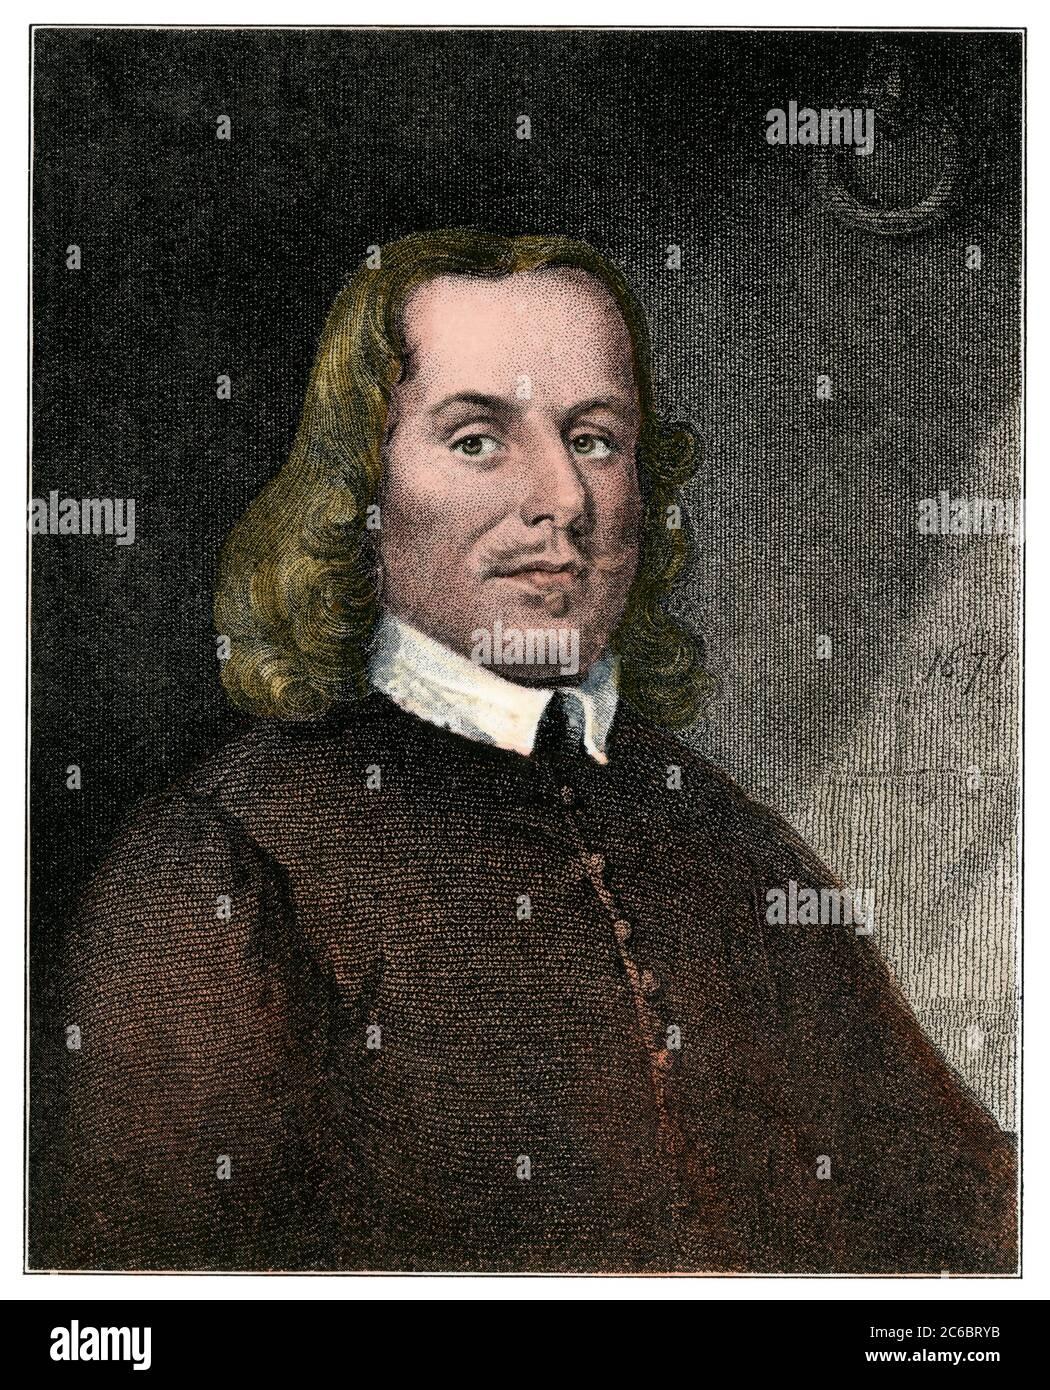 John Bunyan, author of The Pilgrim's Progress. Hand-colored halftone of an illustration Stock Photo